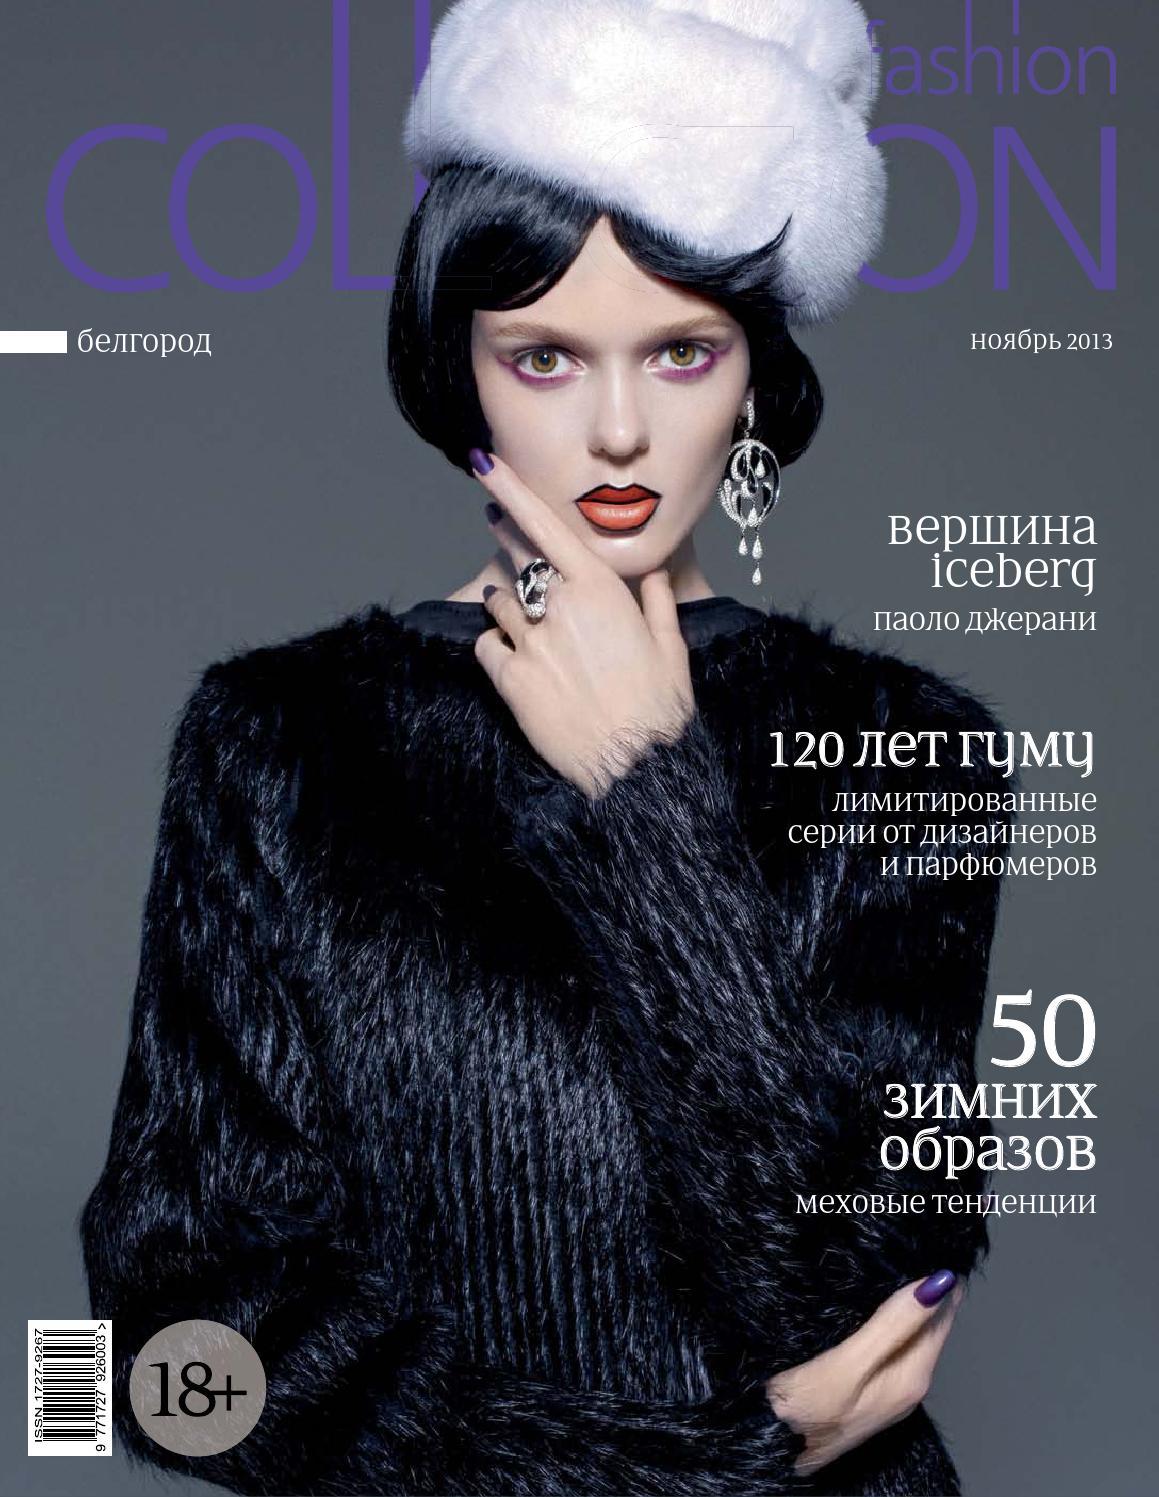 Fashion Collection November  2013 by Fashion Collection Belgorod - issuu 160de1e88f4